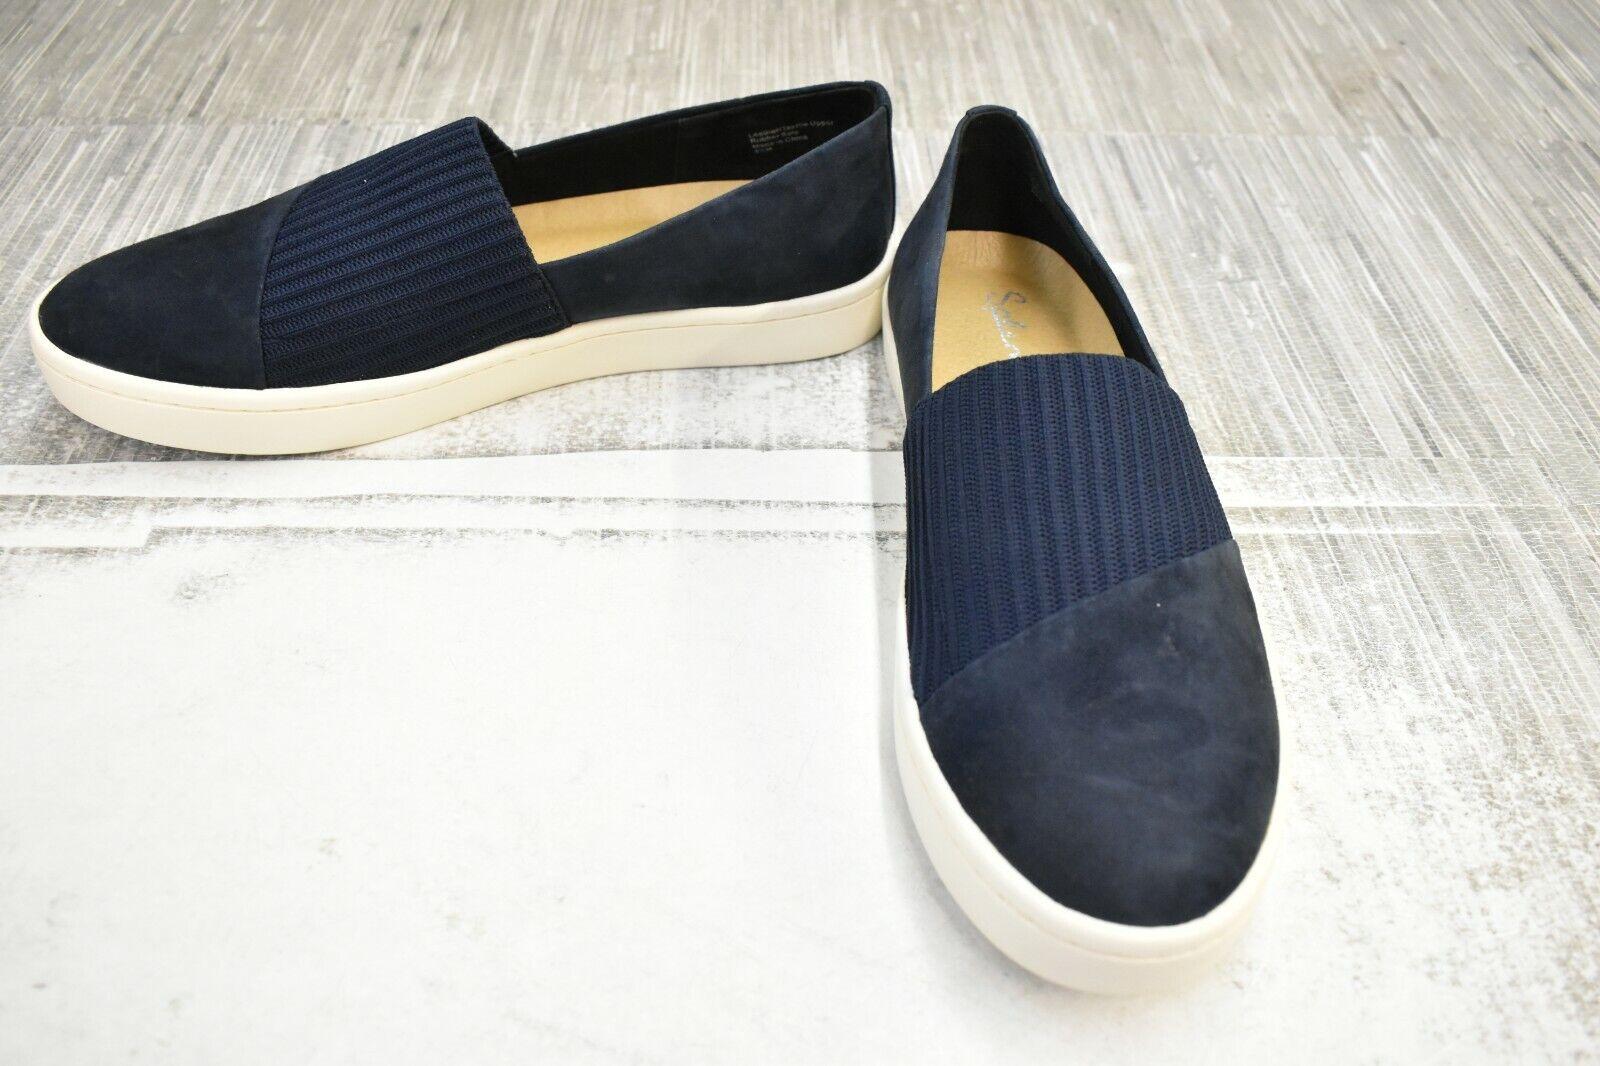 Splendid Nouvel Suede Slip On Sneakers, Women's Size 8.5M, Navy NEW